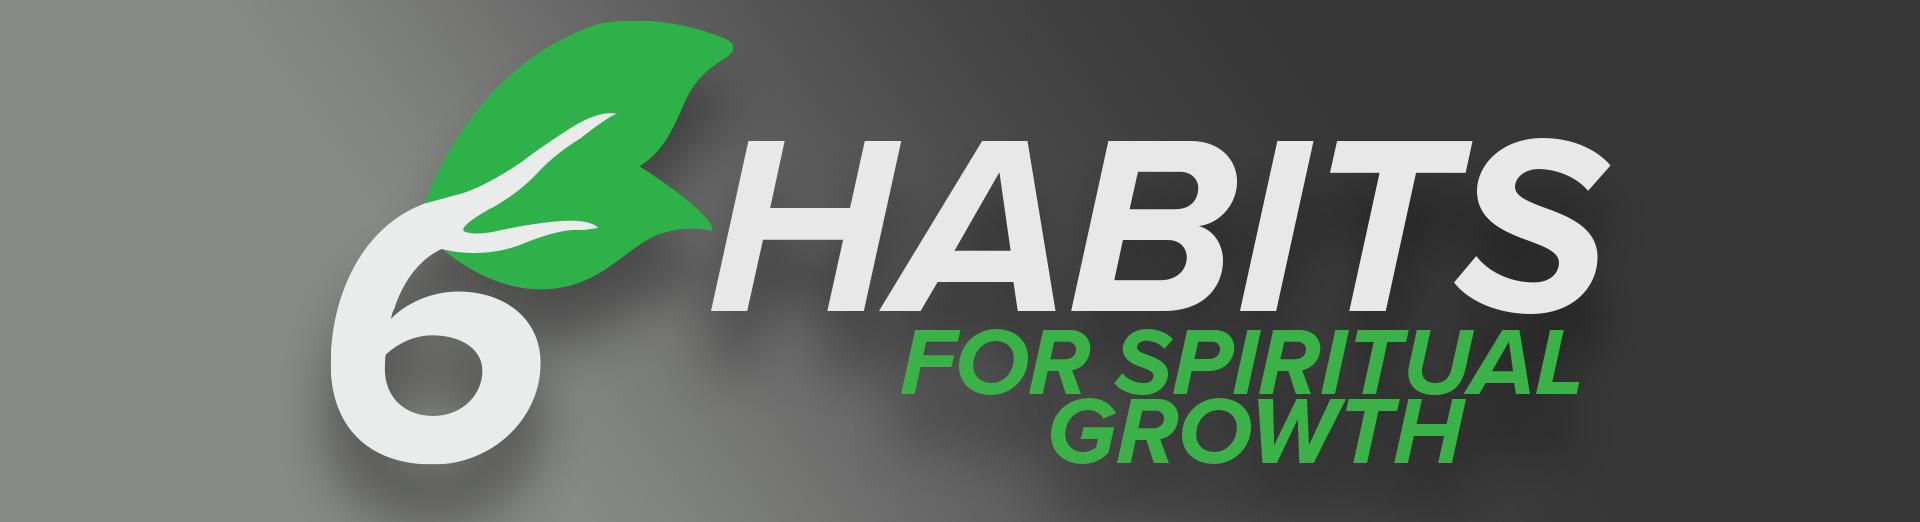 Habbits Banner Bulletin.png